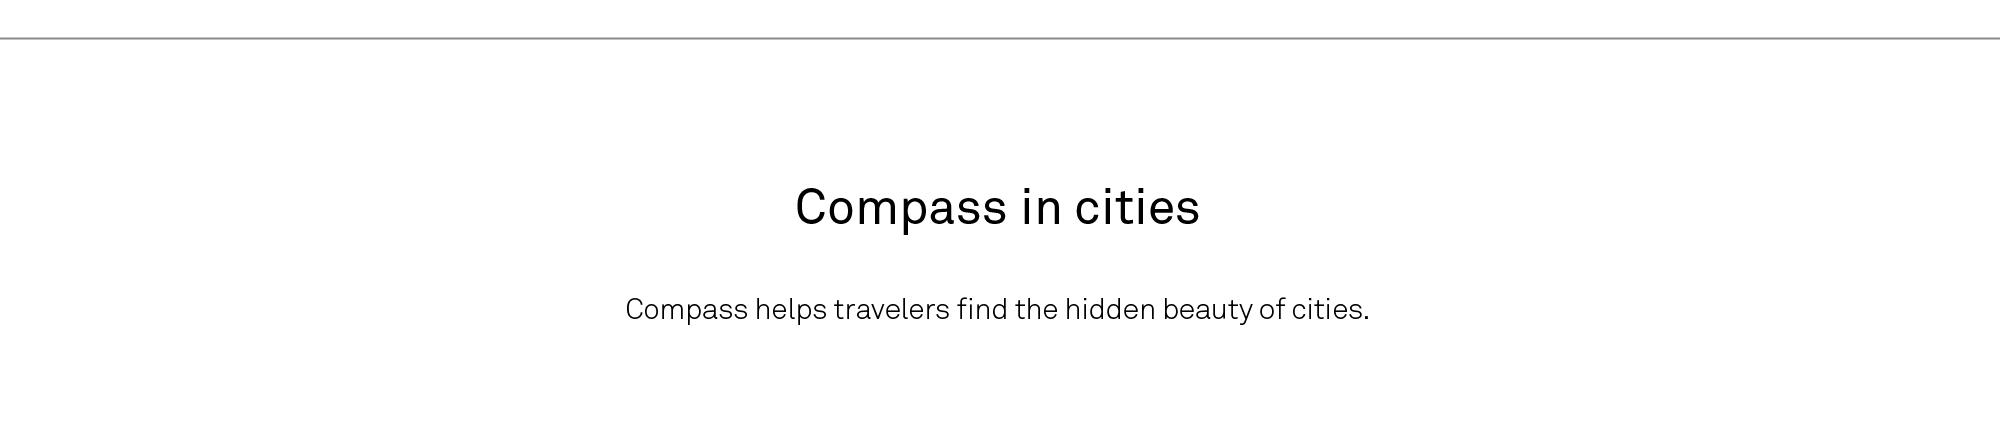 compass copy-17.jpg